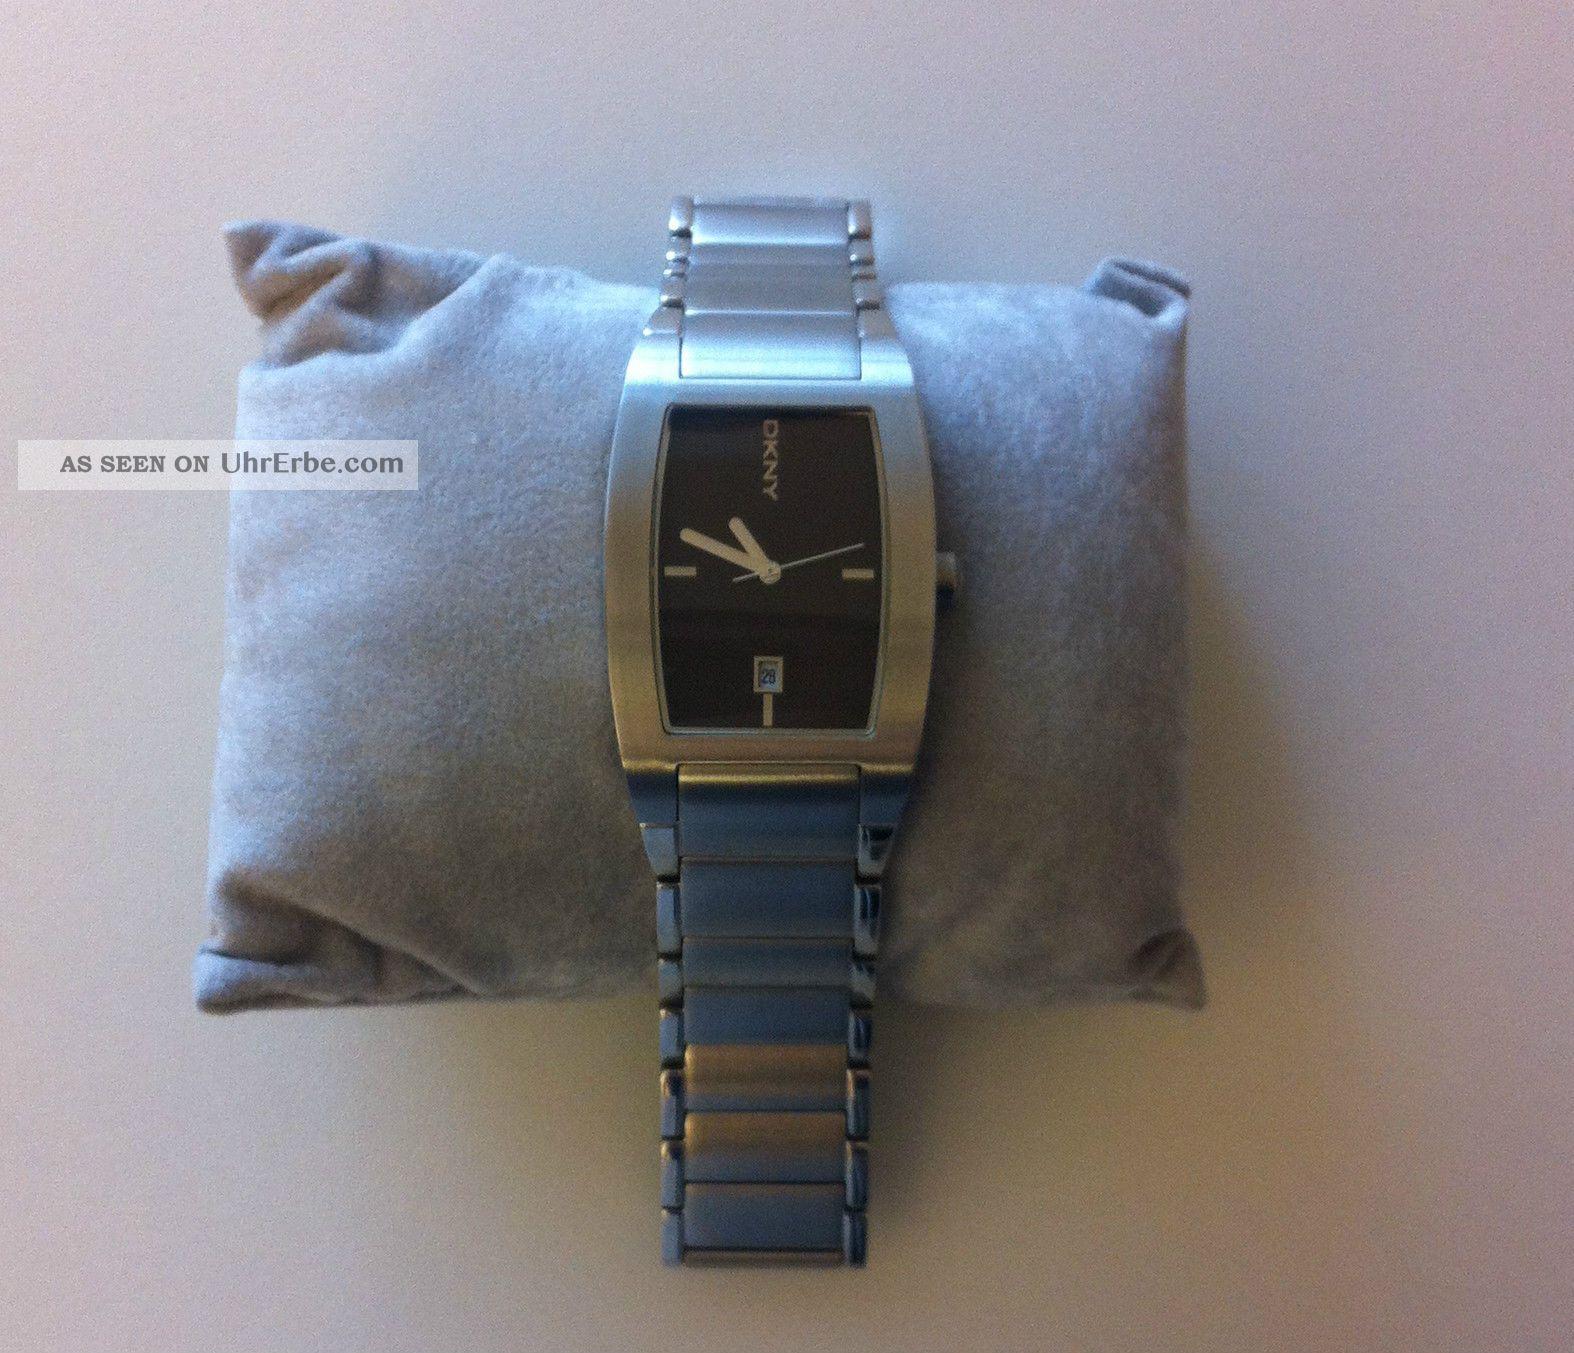 Dkny Time Herren - Armbanduhr Edelstahl Top Armbanduhren Bild